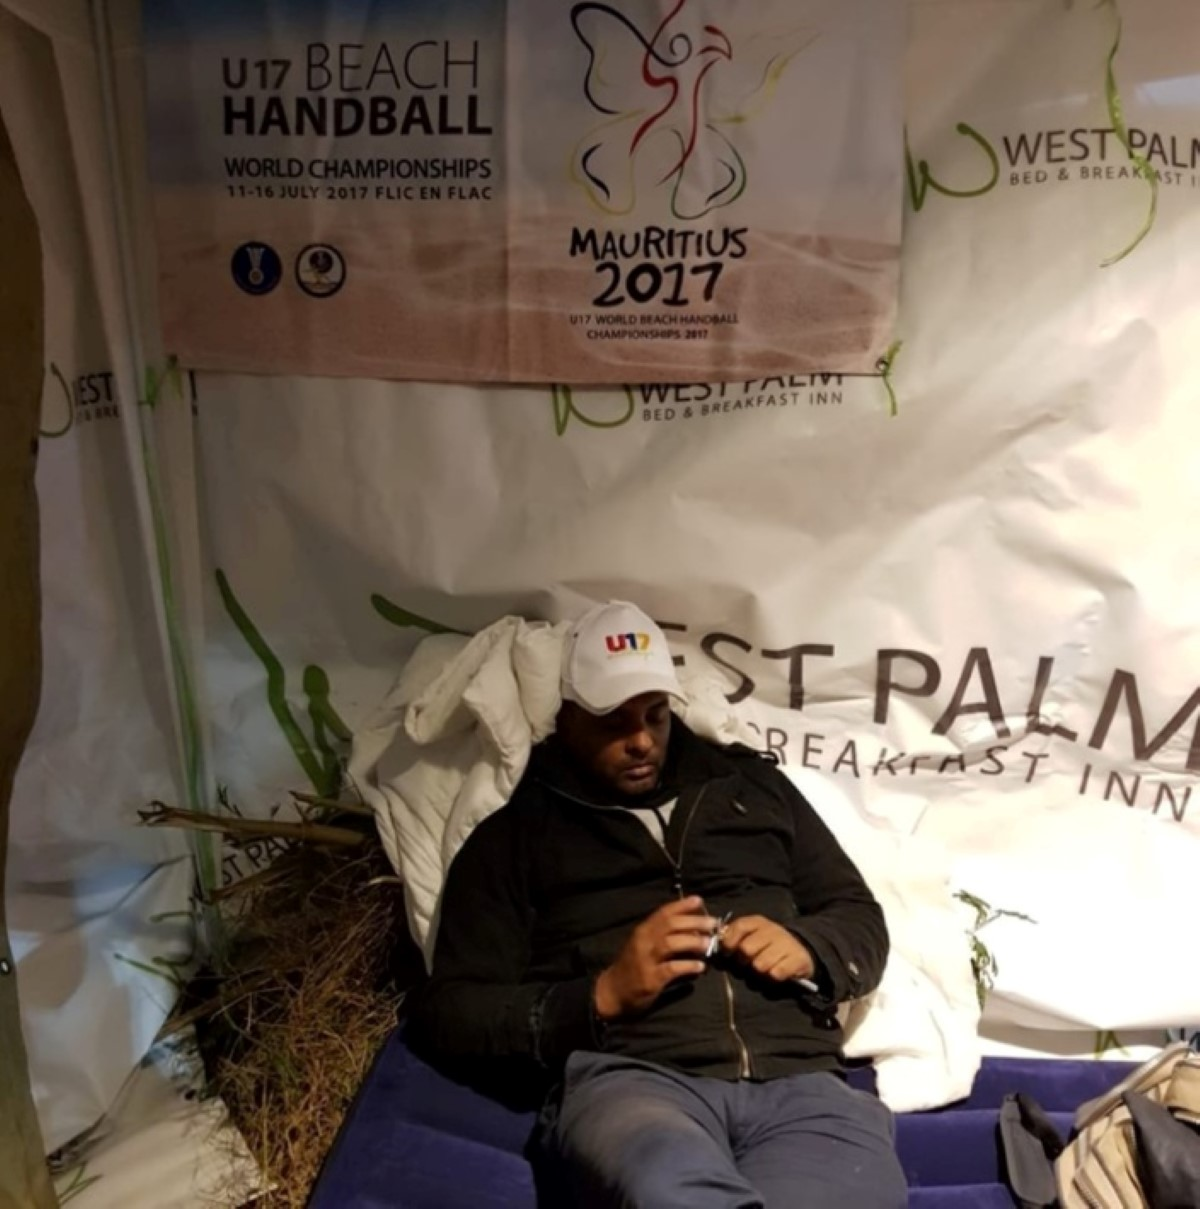 10e jour de grève de la faim : Gérald Alcindor proteste contre la Mauritius Handball Association